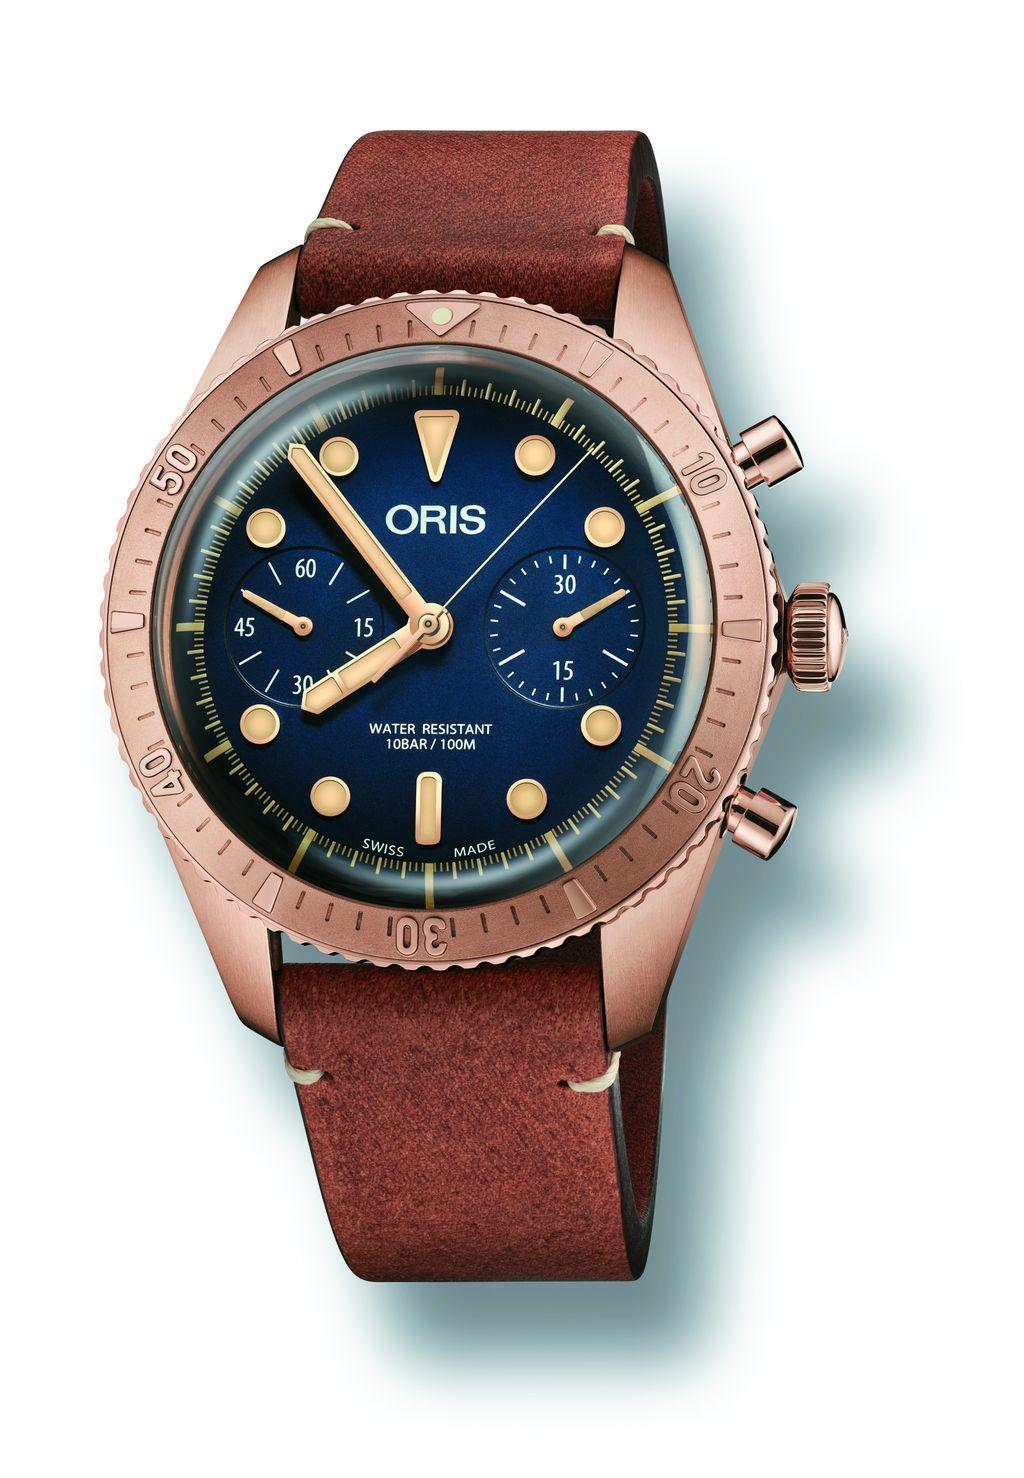 ORIS Carl Brashear青銅限量計時碼錶